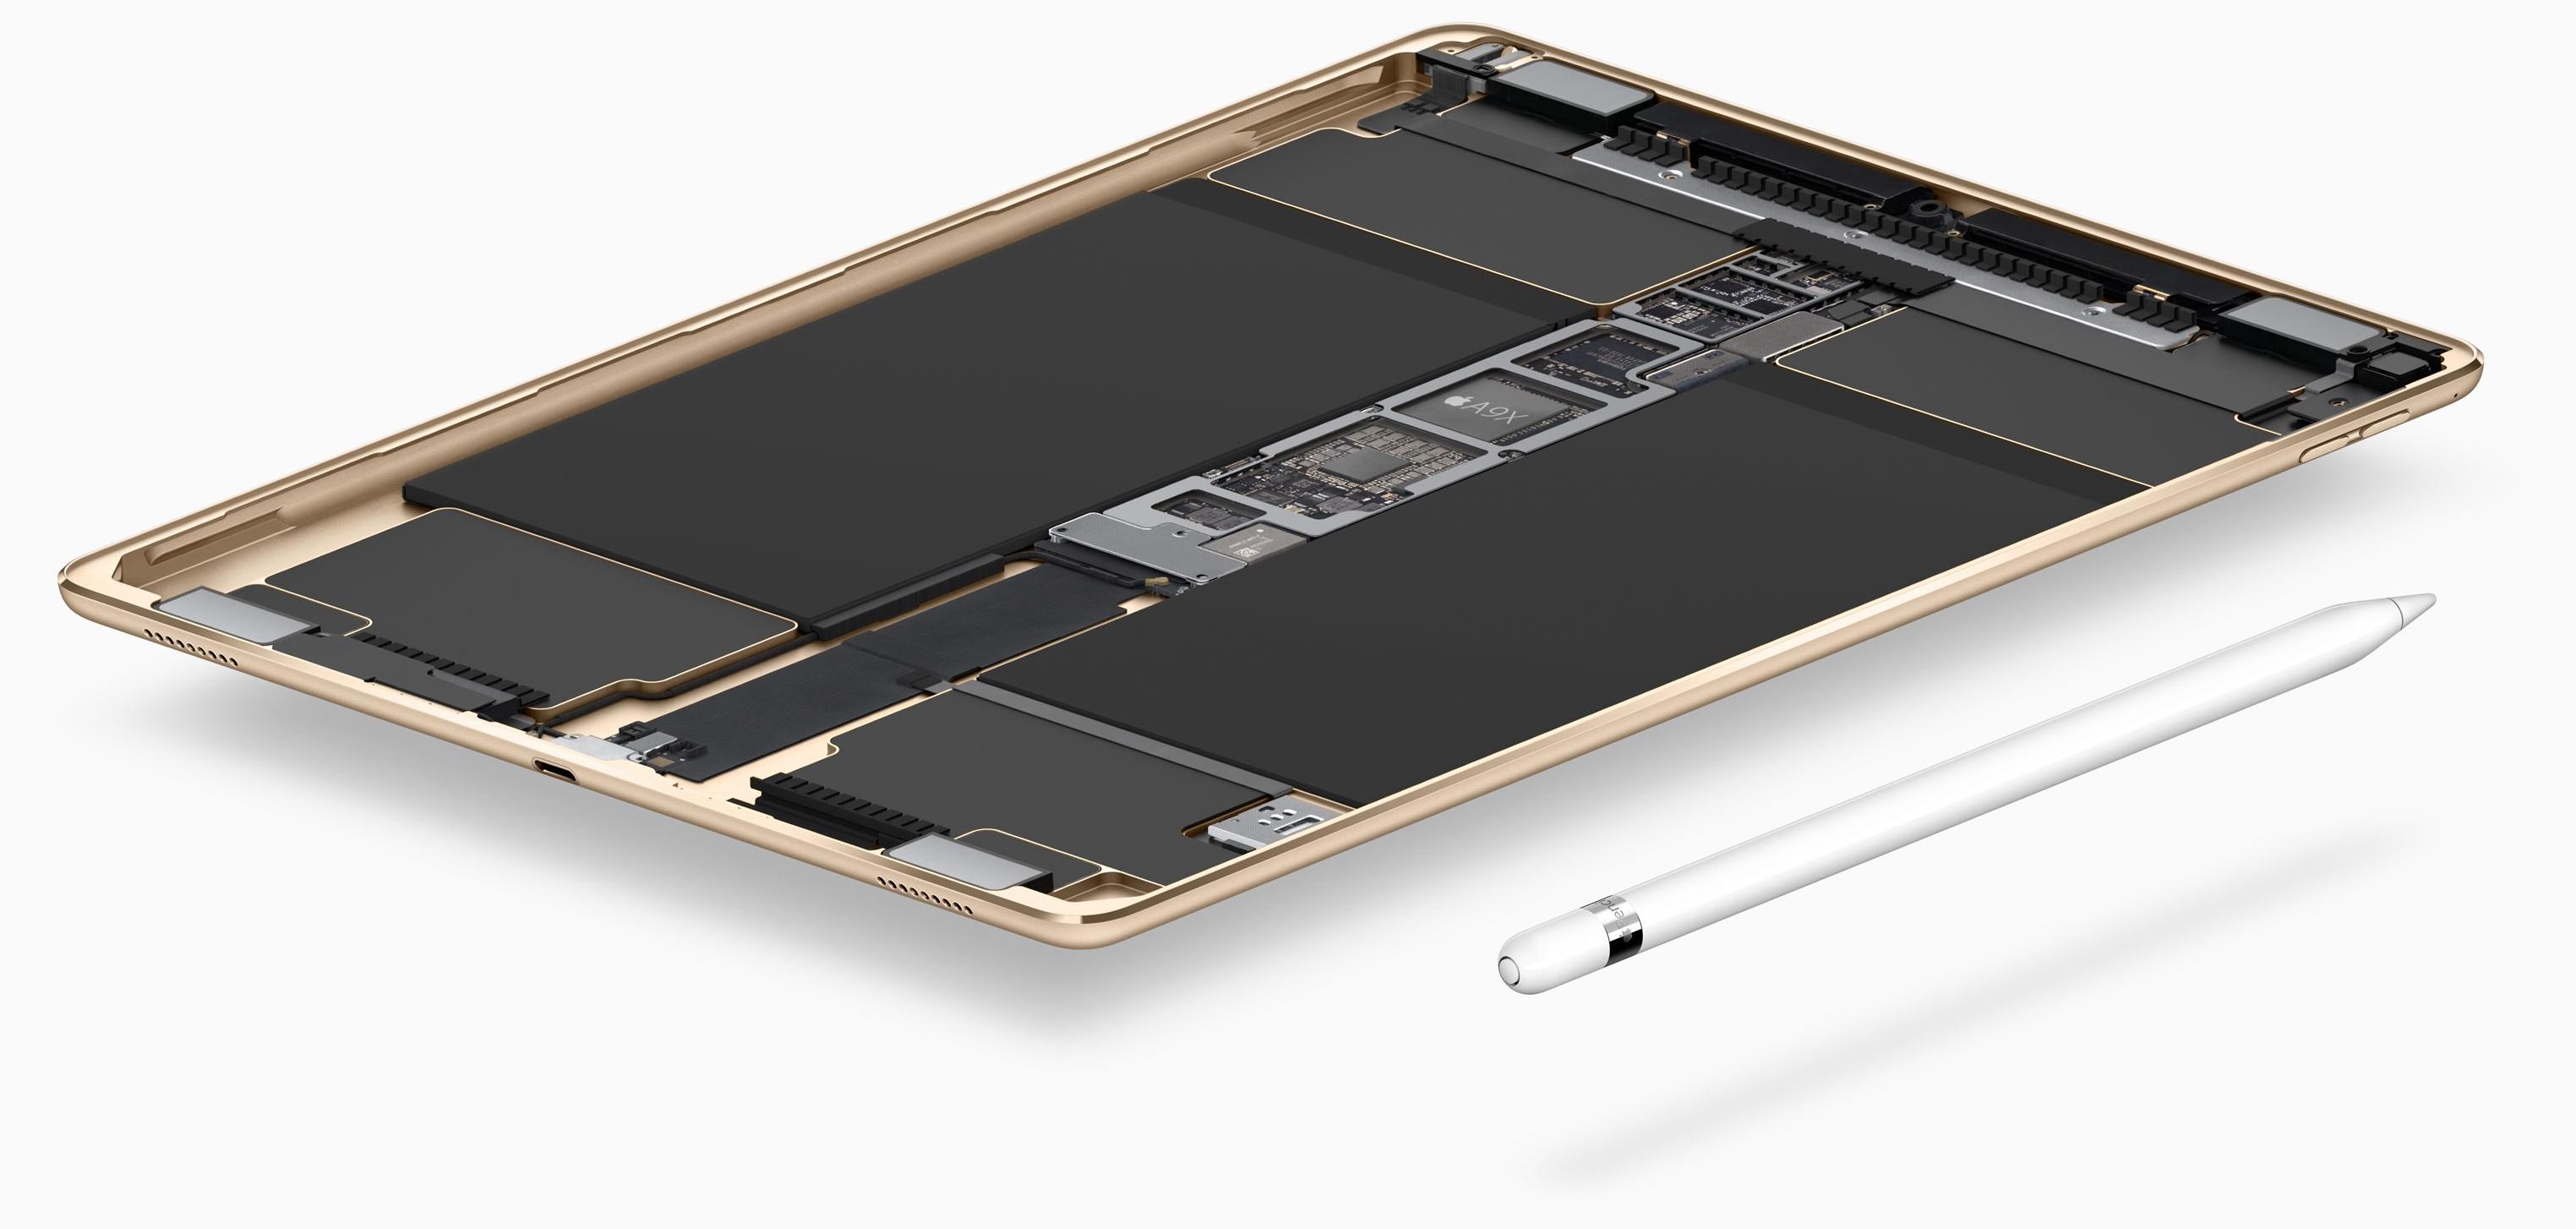 9.7-inch iPad Pro interior